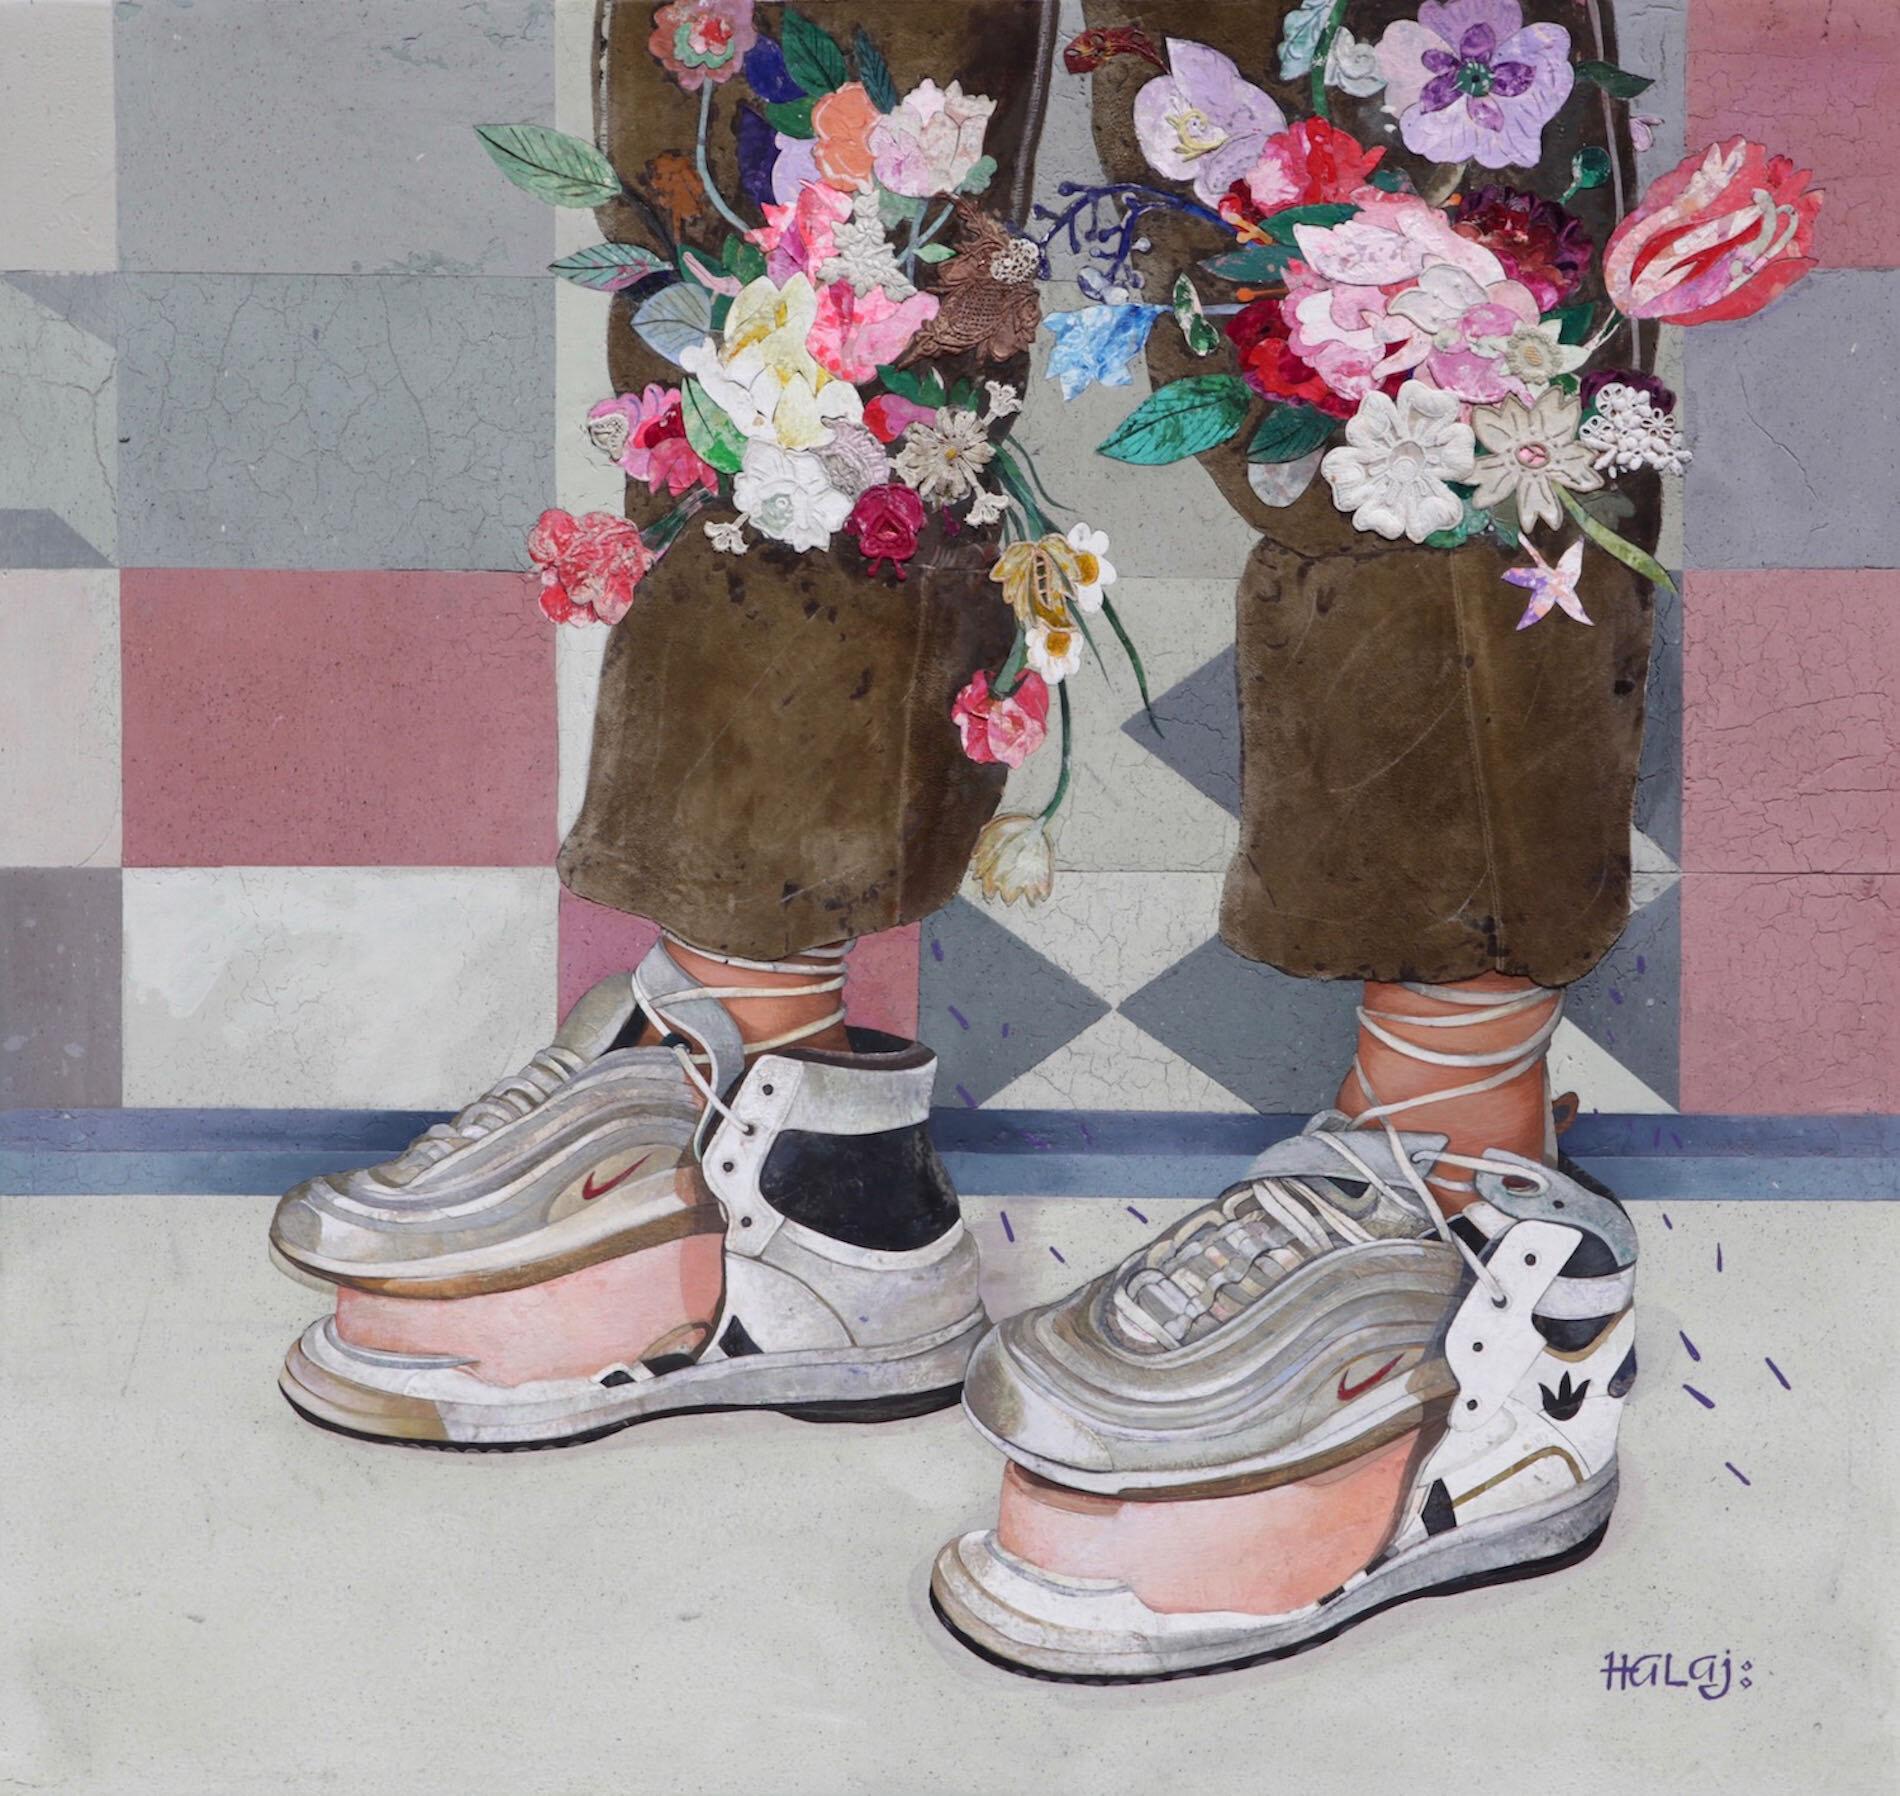 Minas Halaj %22 Nikes On My Feet %22 2018, Oil, wax, textile, mixed media on panel, 34x36 in. (86.36x91.44 cm.).jpg